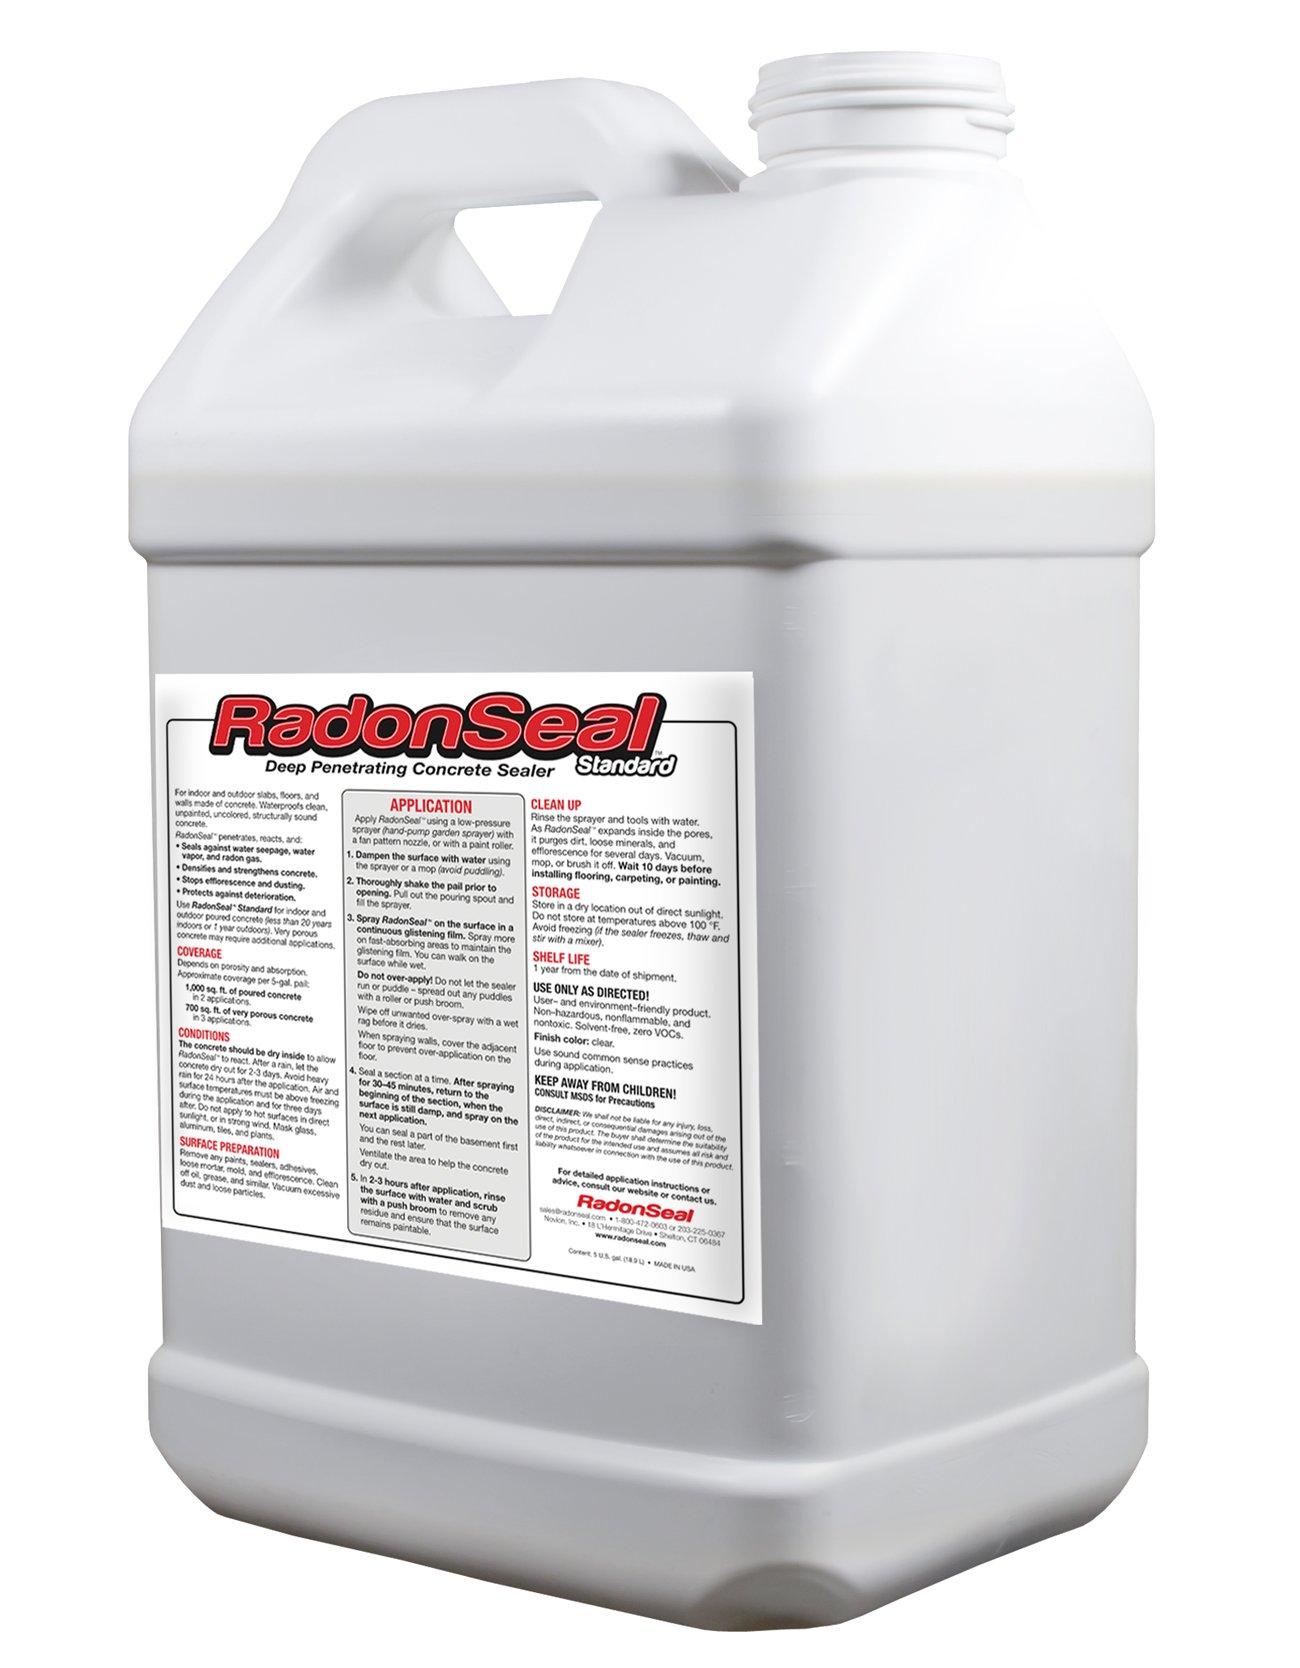 RadonSeal Standard – Deep Penetrating Concrete Sealer (2.5-gal) | Basement Waterproofing & Radon Mitigation Sealer | Seals Against Water Vapor, Water Seepage, & Radon Gas Permanently!